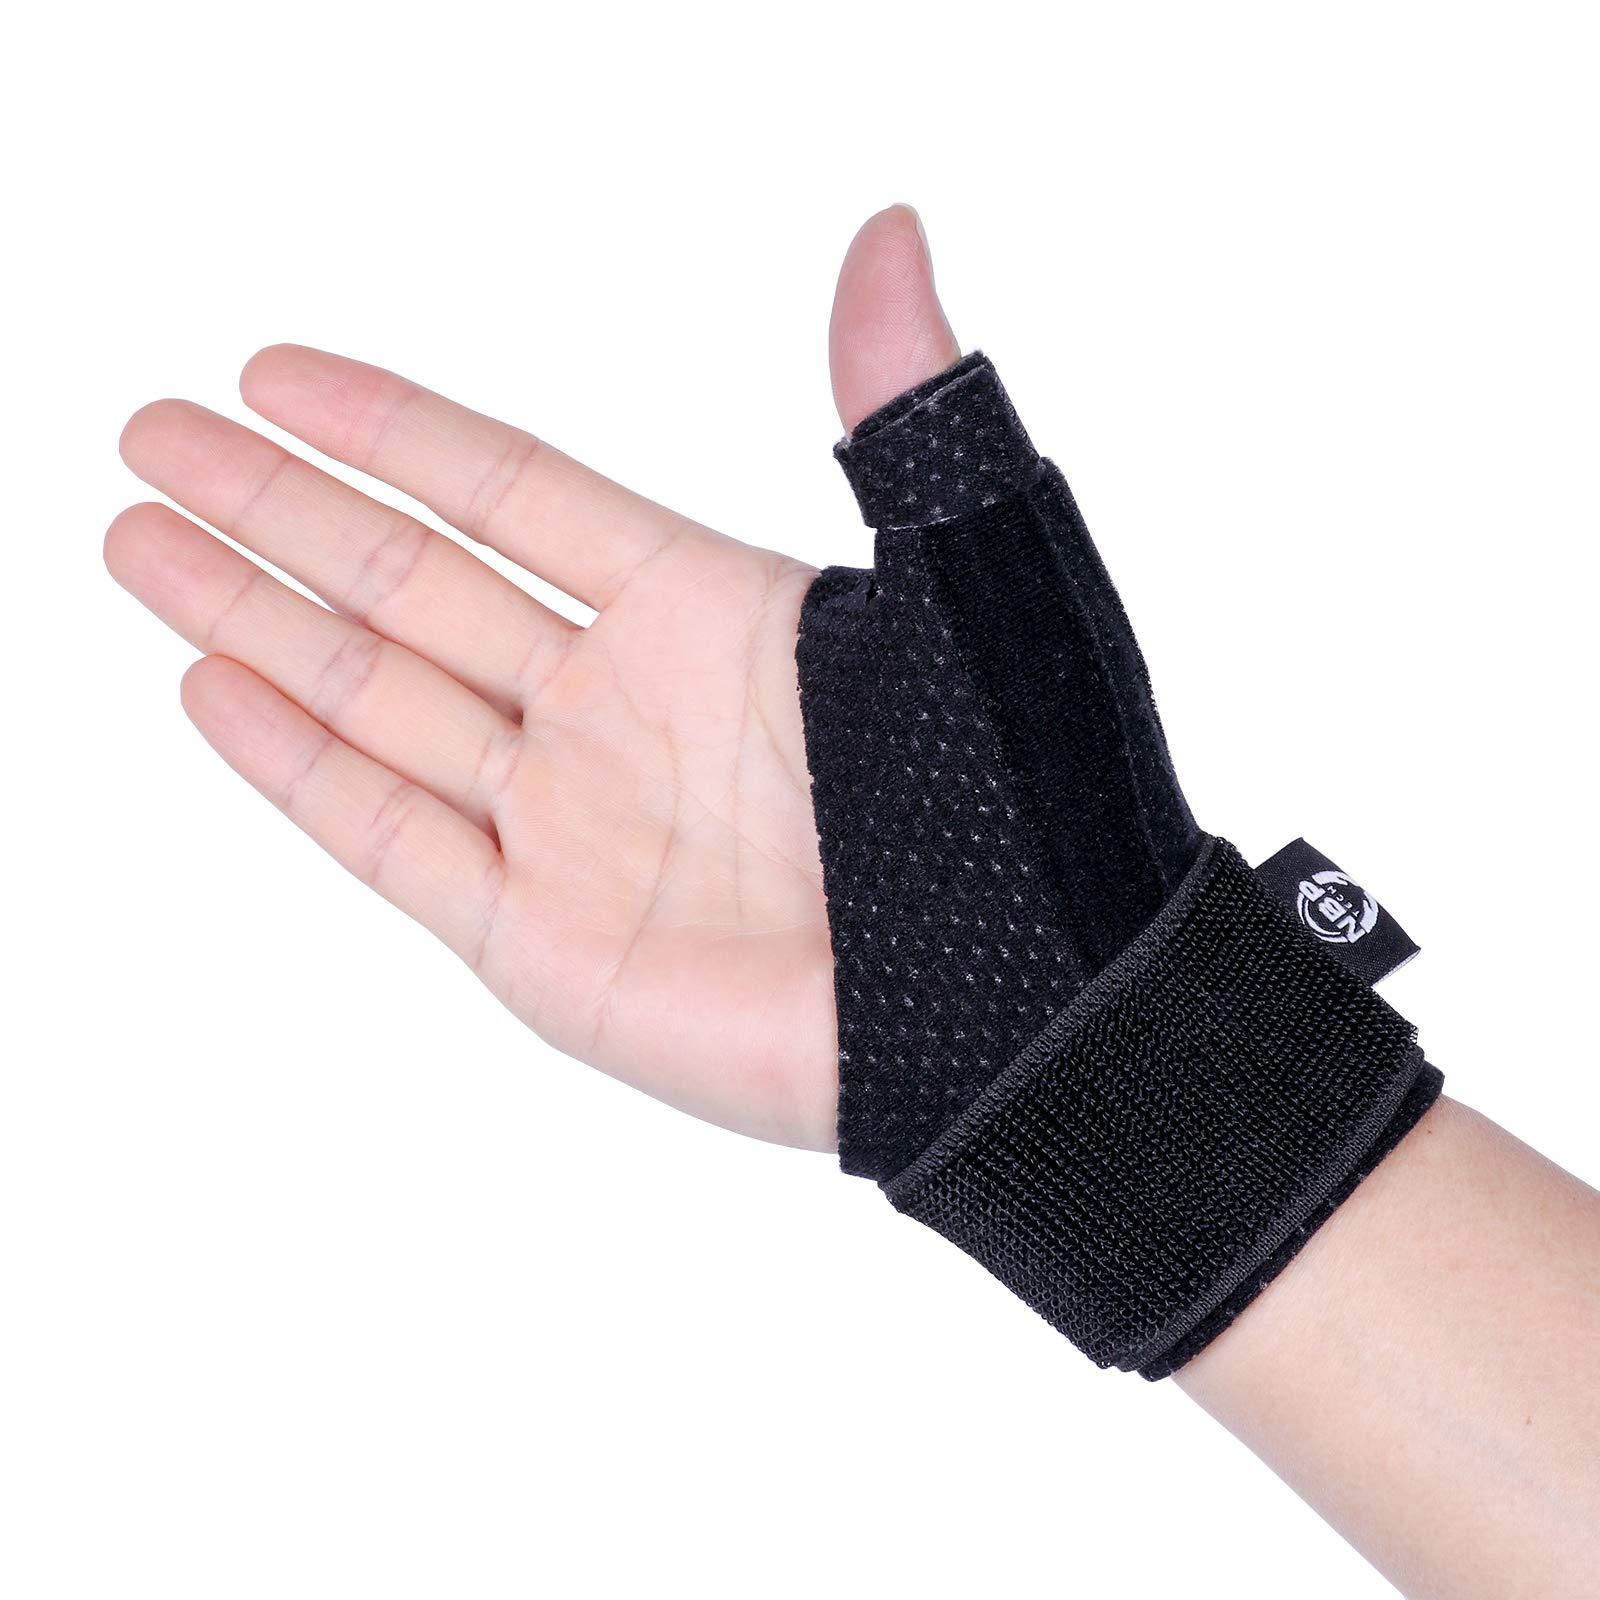 Reversible Stabilizer BlackBerry Tendonitis Lightweight